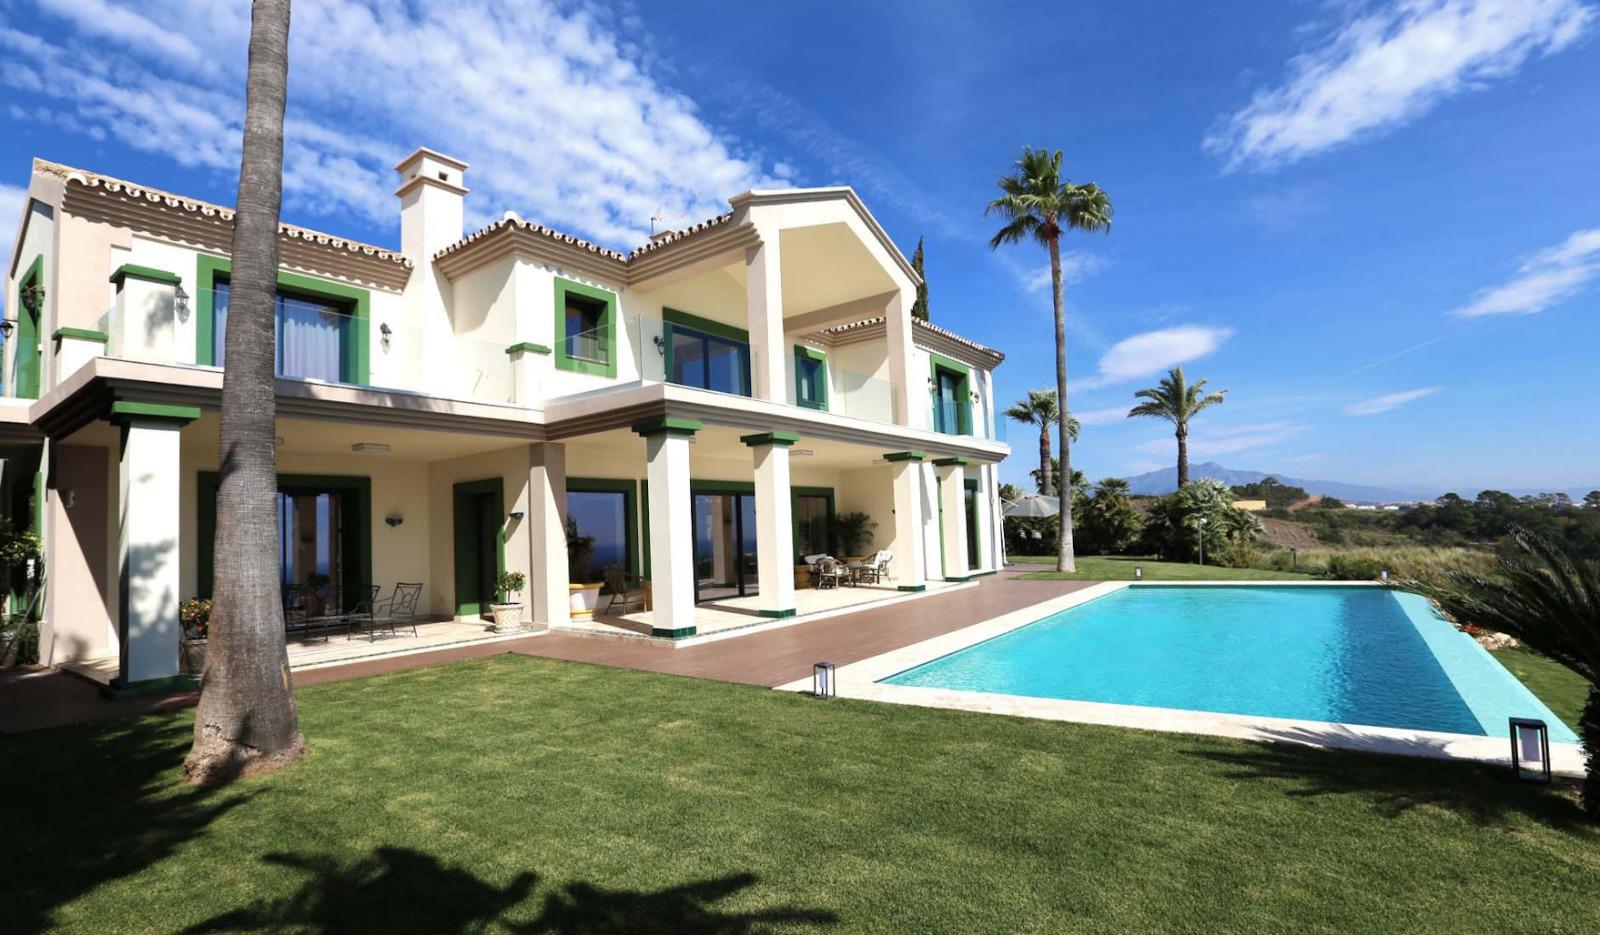 LONG TERM RENTAL – Luxury Modern Villa with Unbeatable Views in Selwo Area